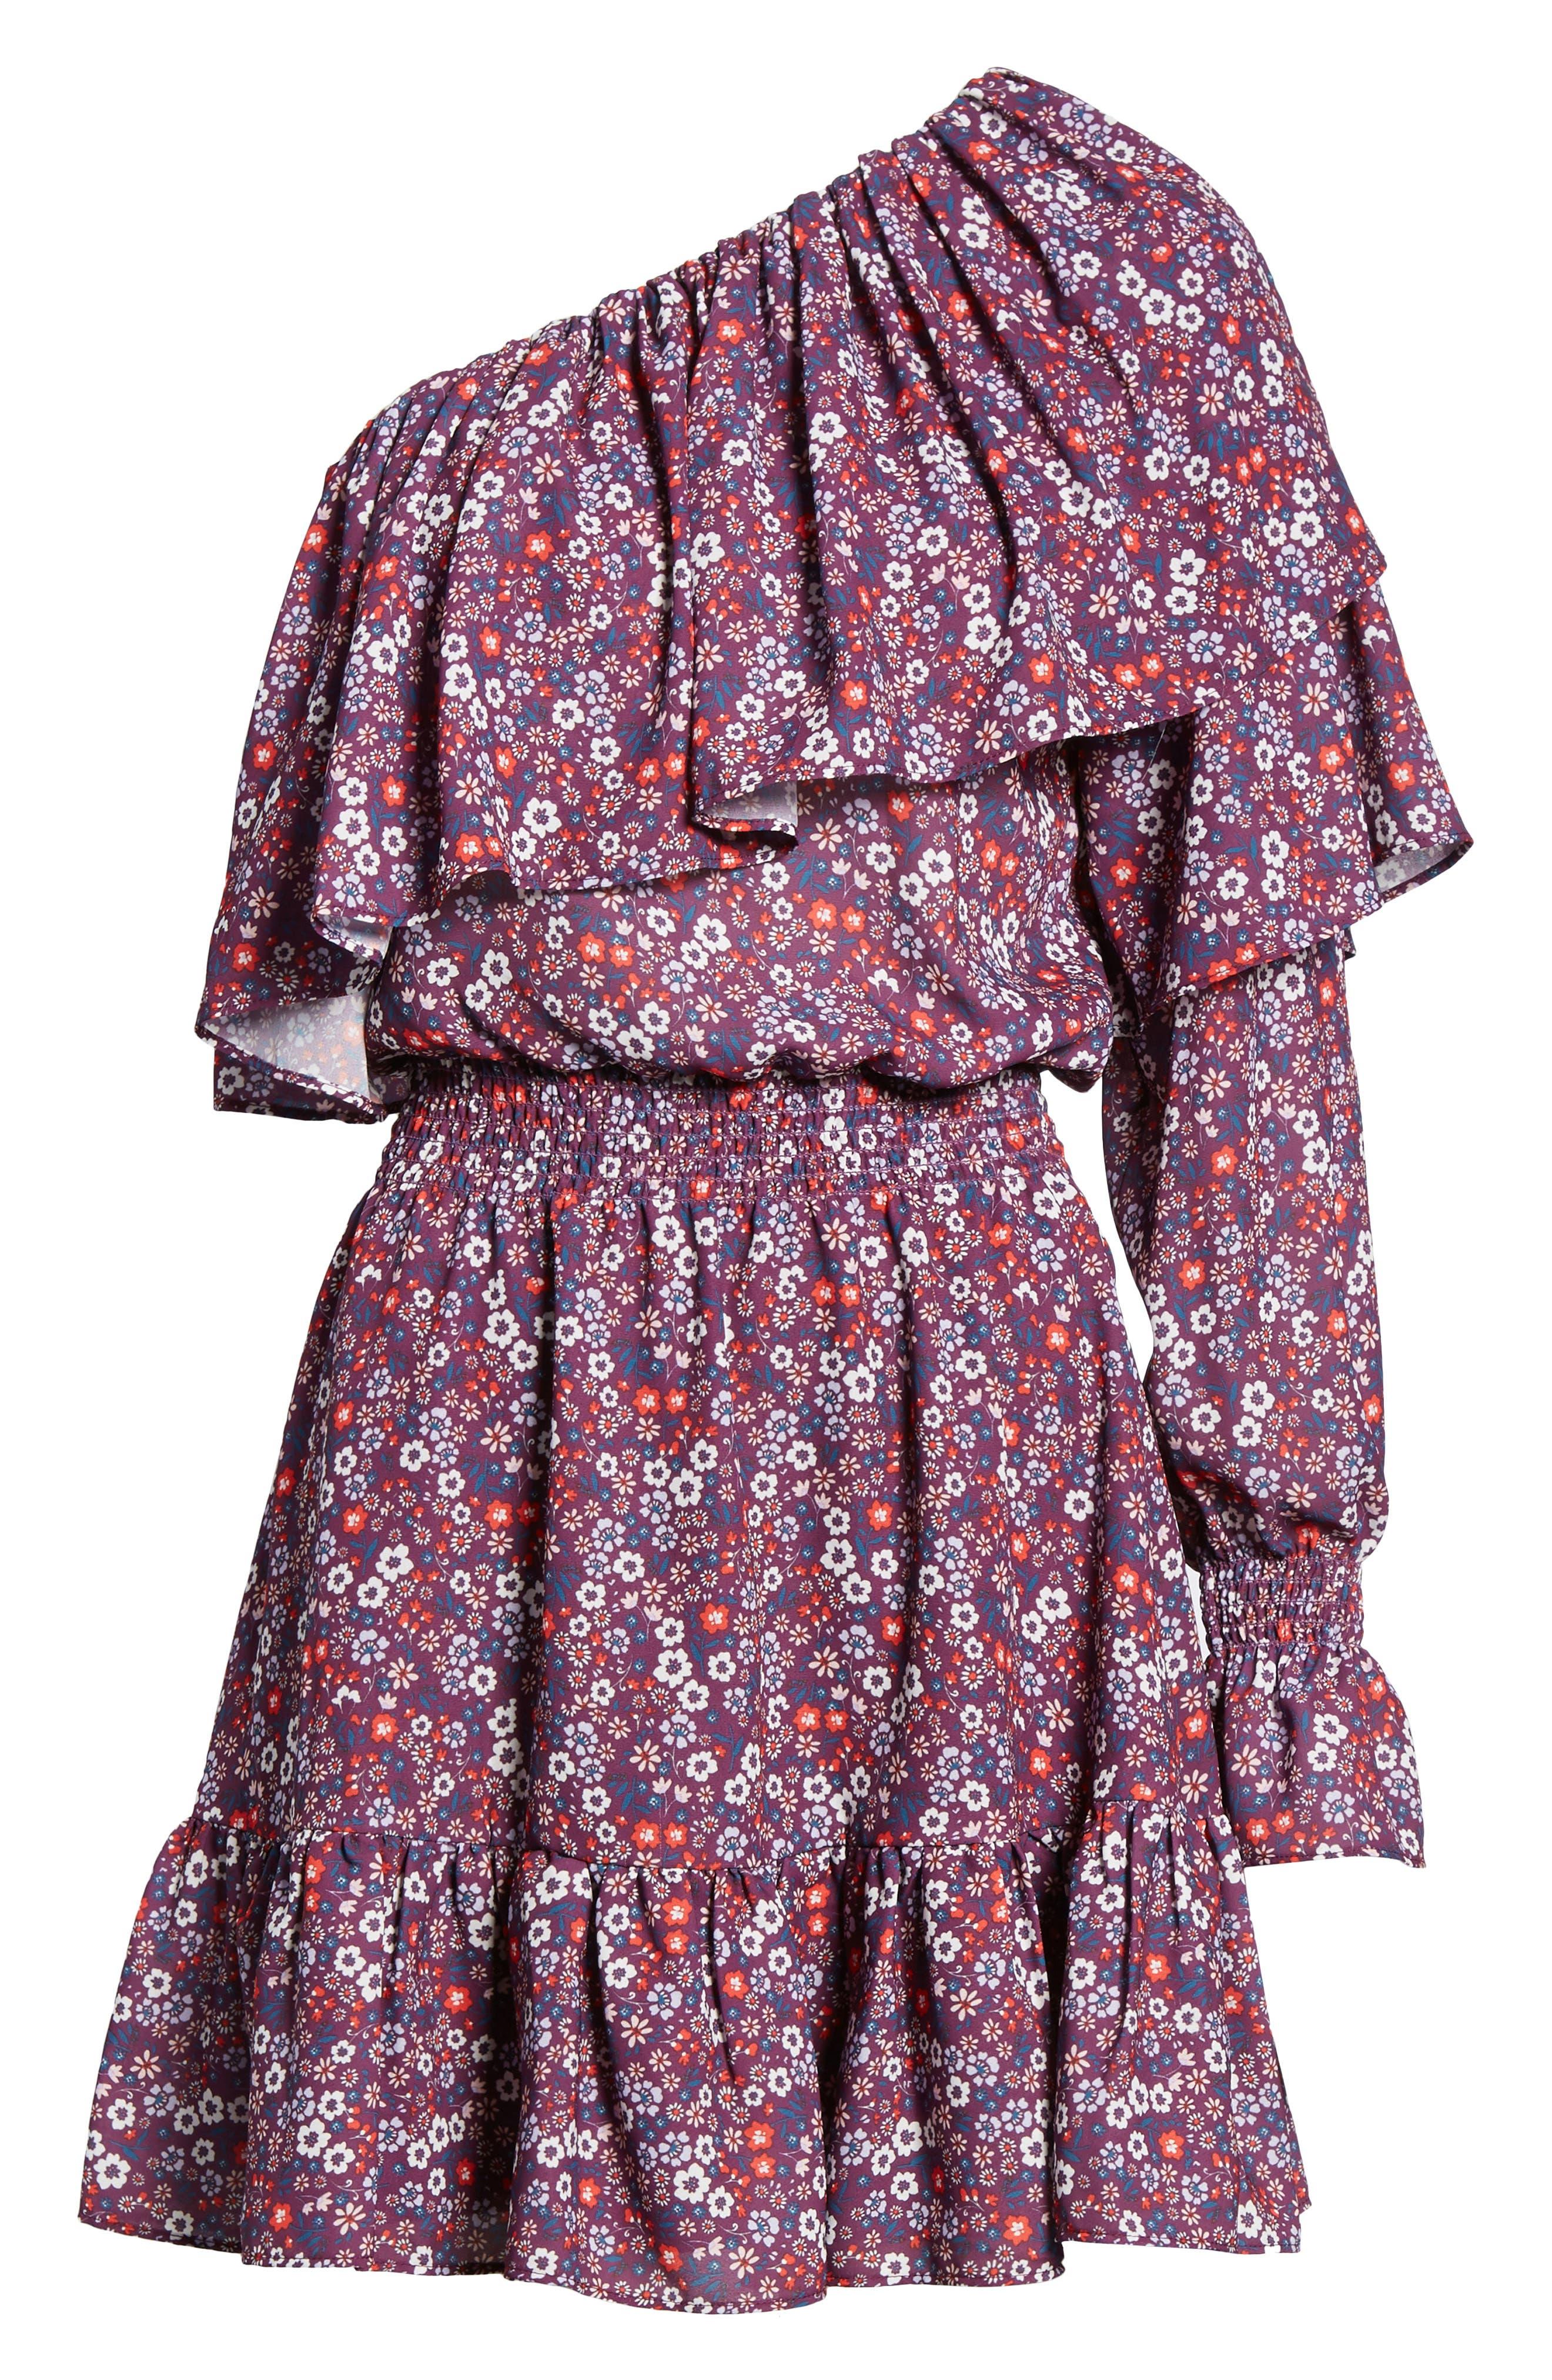 Irina One-Shoulder Blouson Dress,                             Alternate thumbnail 6, color,                             Magnolia